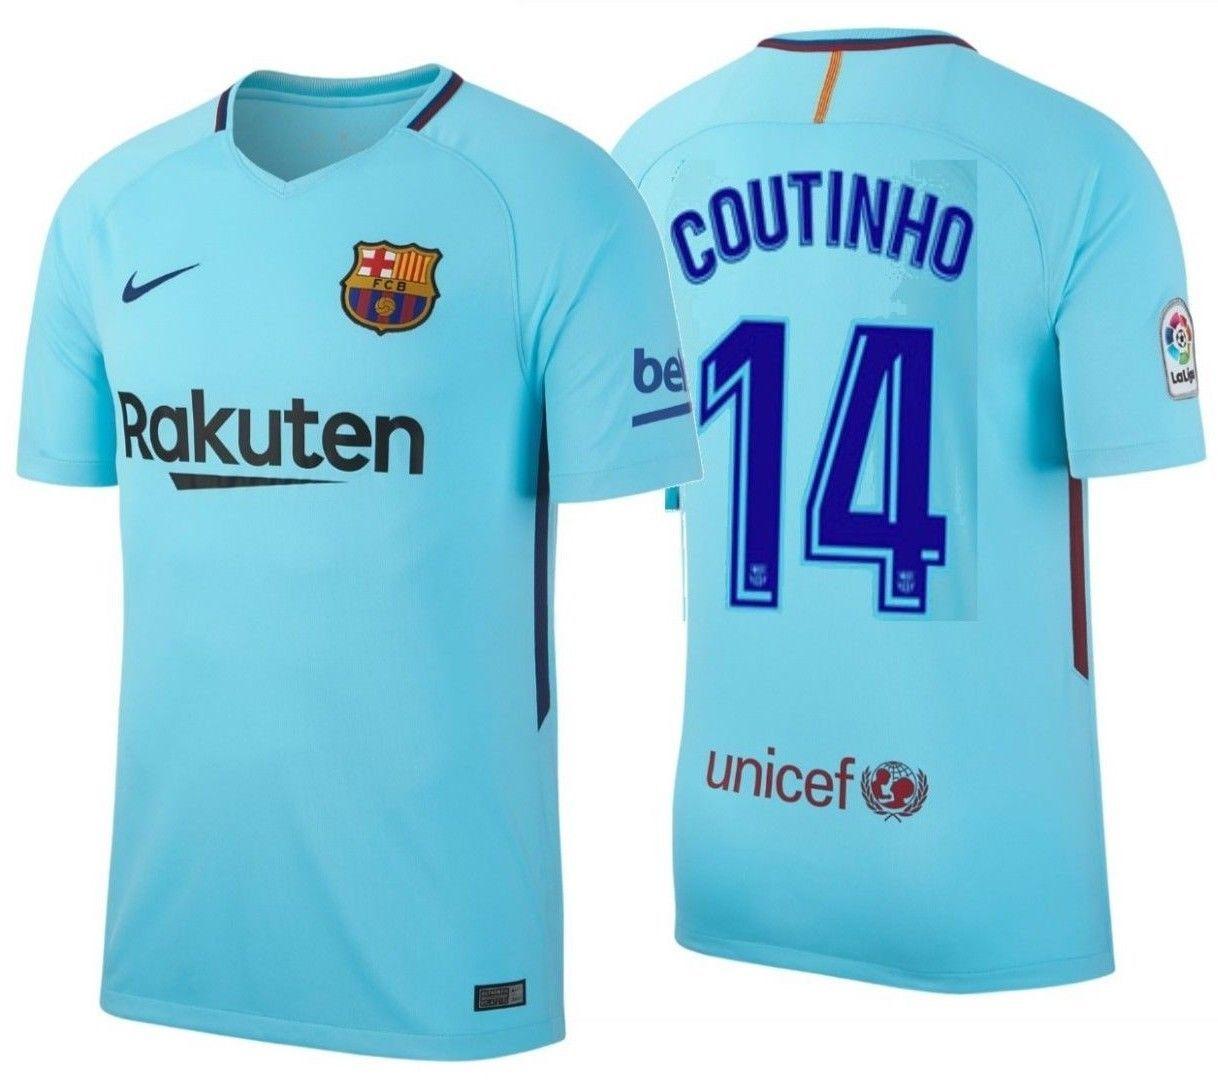 faa547141 Nike Philippe Coutinho Fc Barcelona Away and 38 similar items. 57